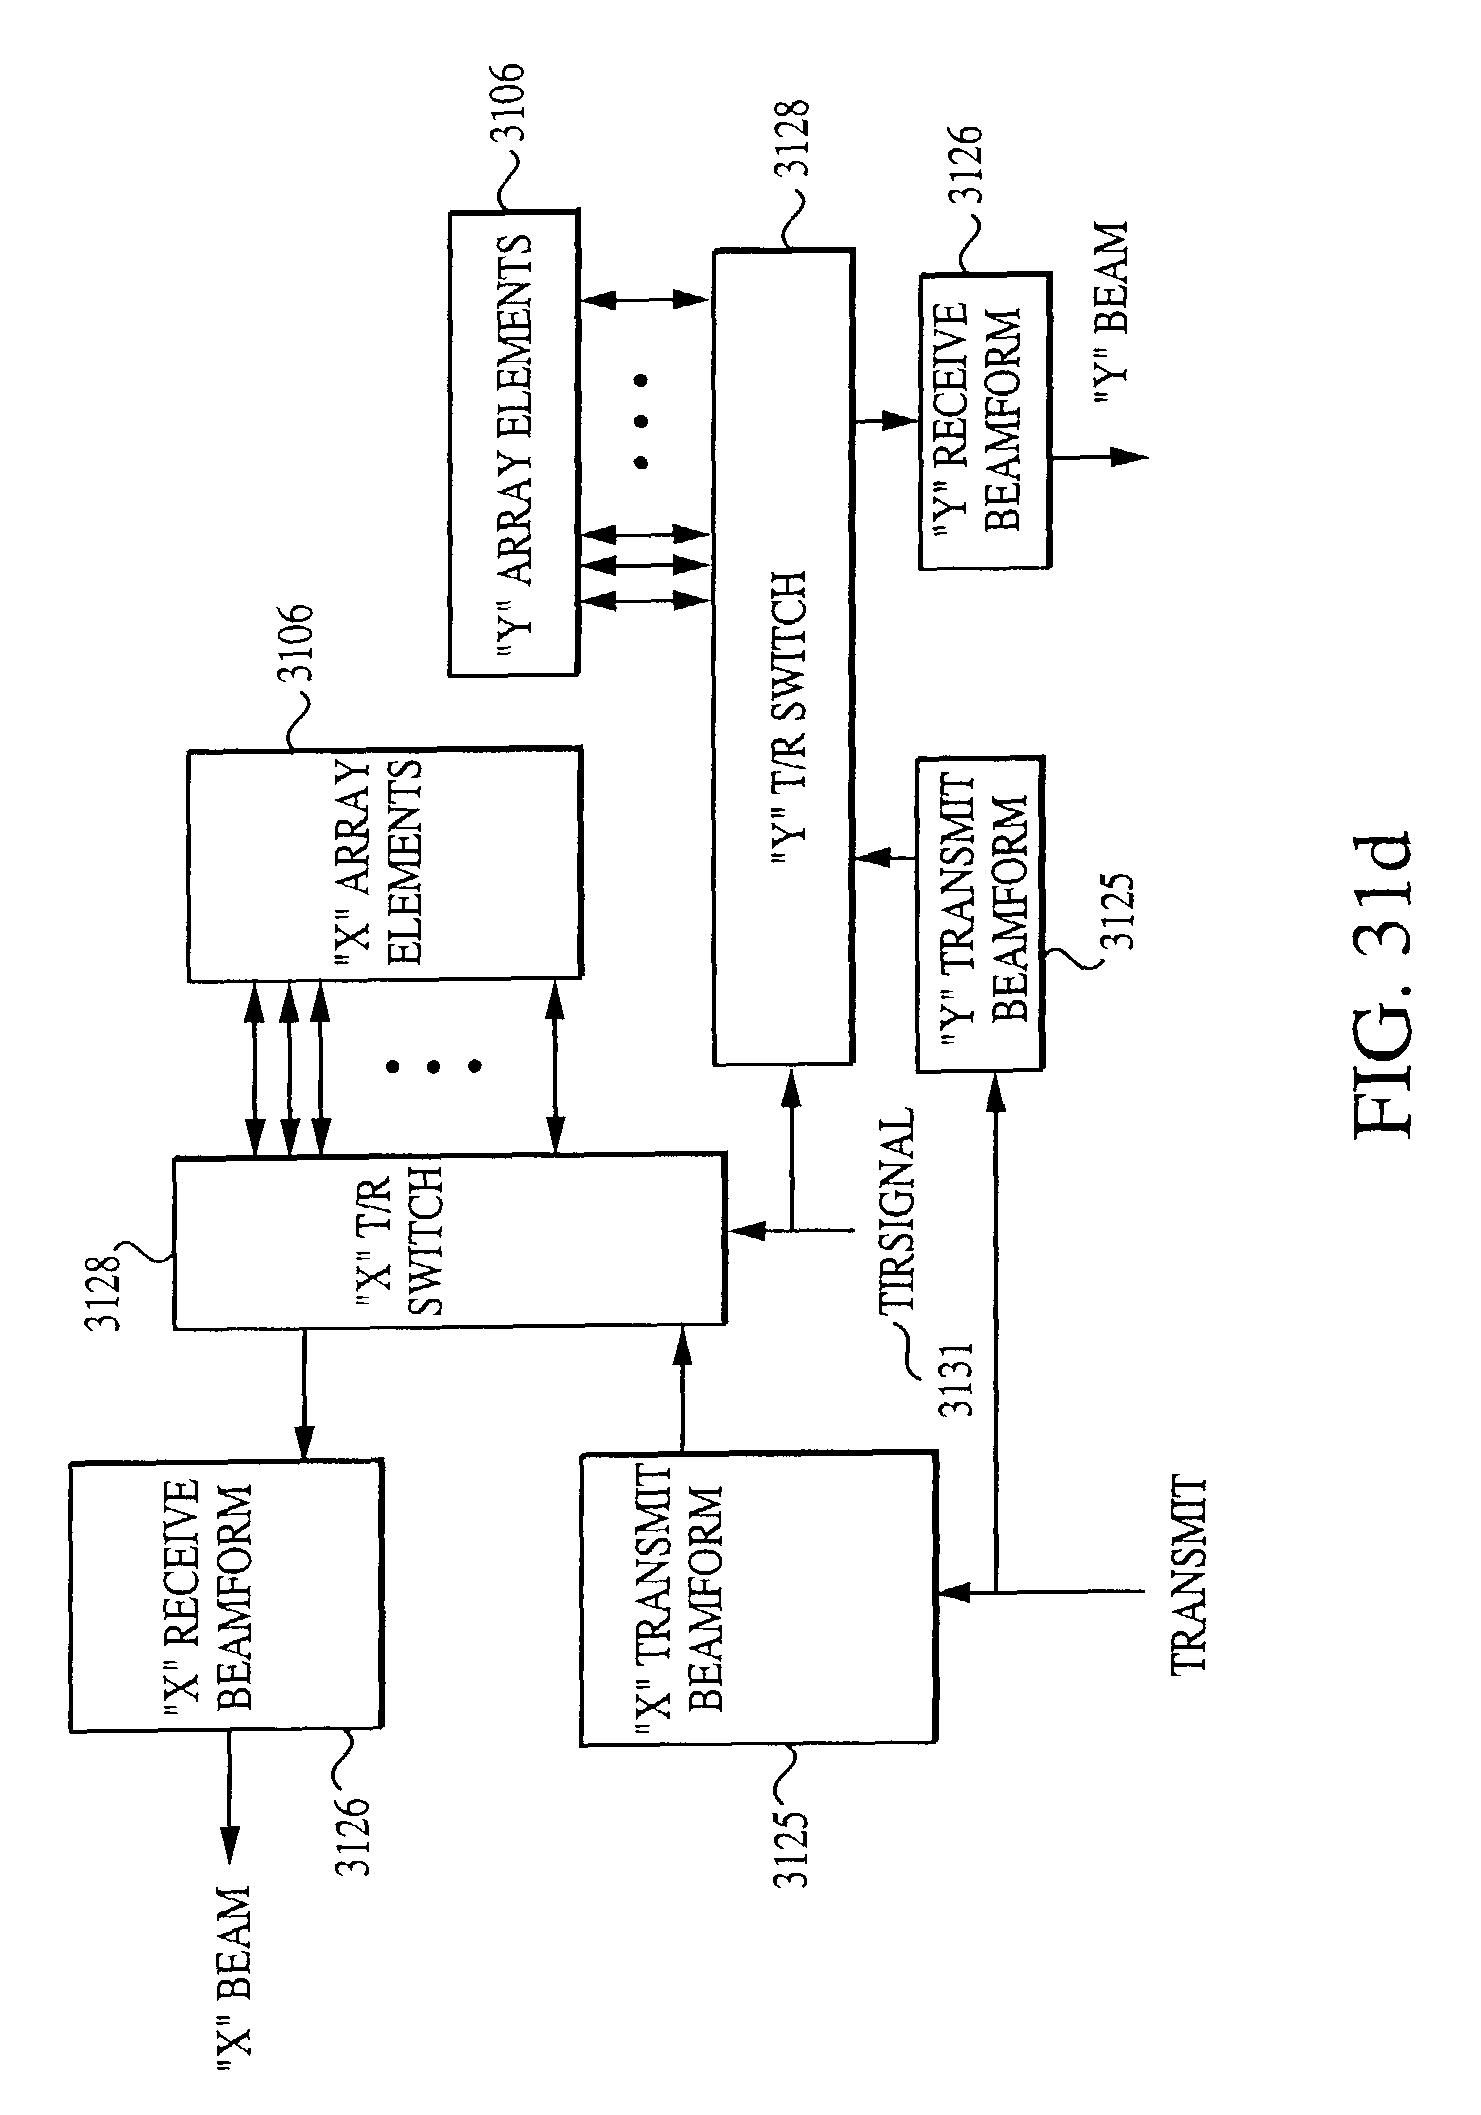 Patent Us 7914442 B1 Igniter Circuit Diagram In Addition Fm Transmitter Litigations